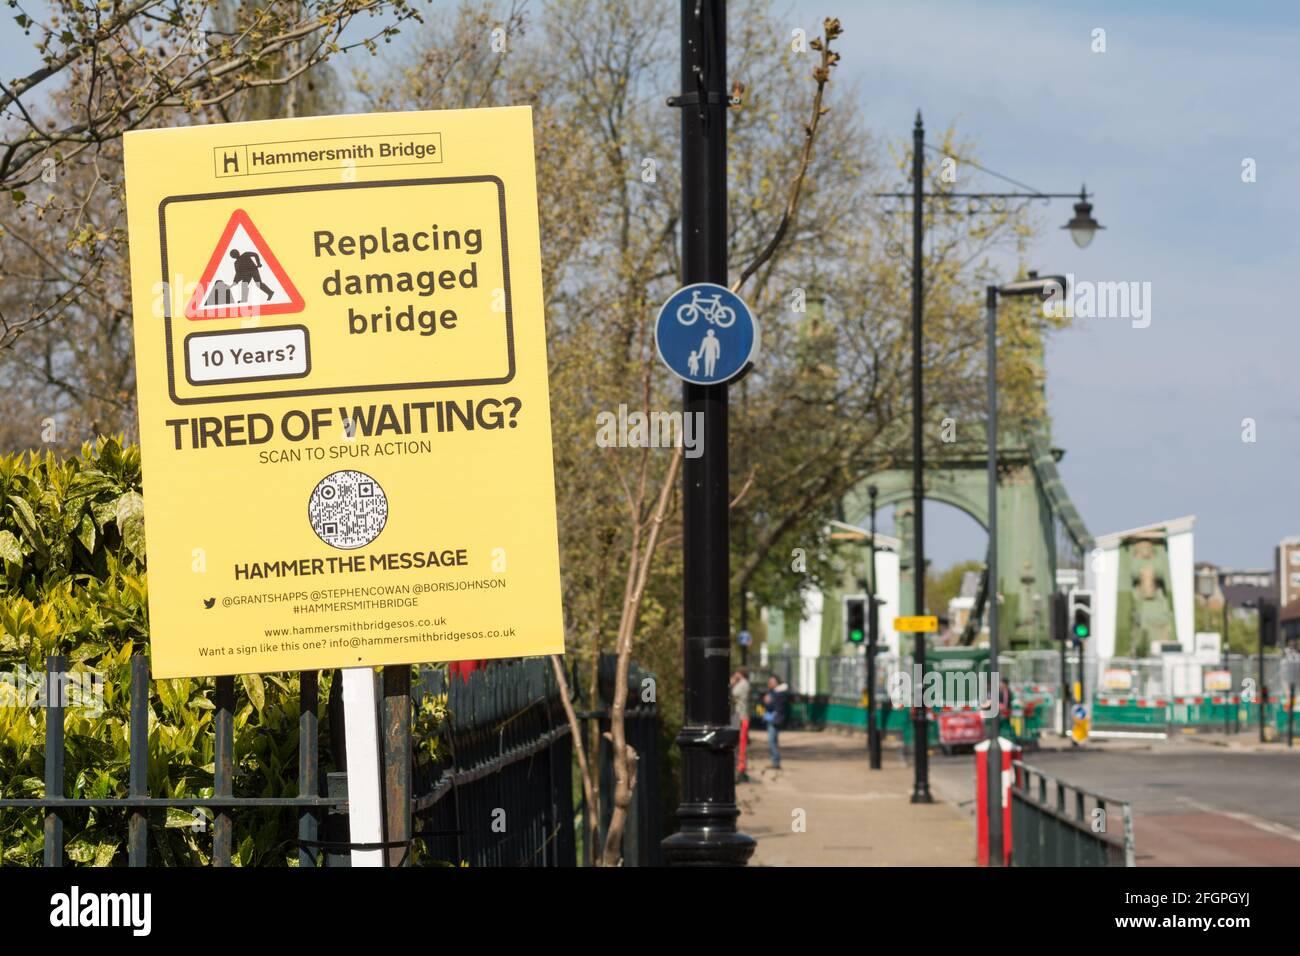 Hammersmith Bridge Campaign Group  - Tired of Waiting placard next to Hammersmith Bridge in southwest London, U.K. Stock Photo